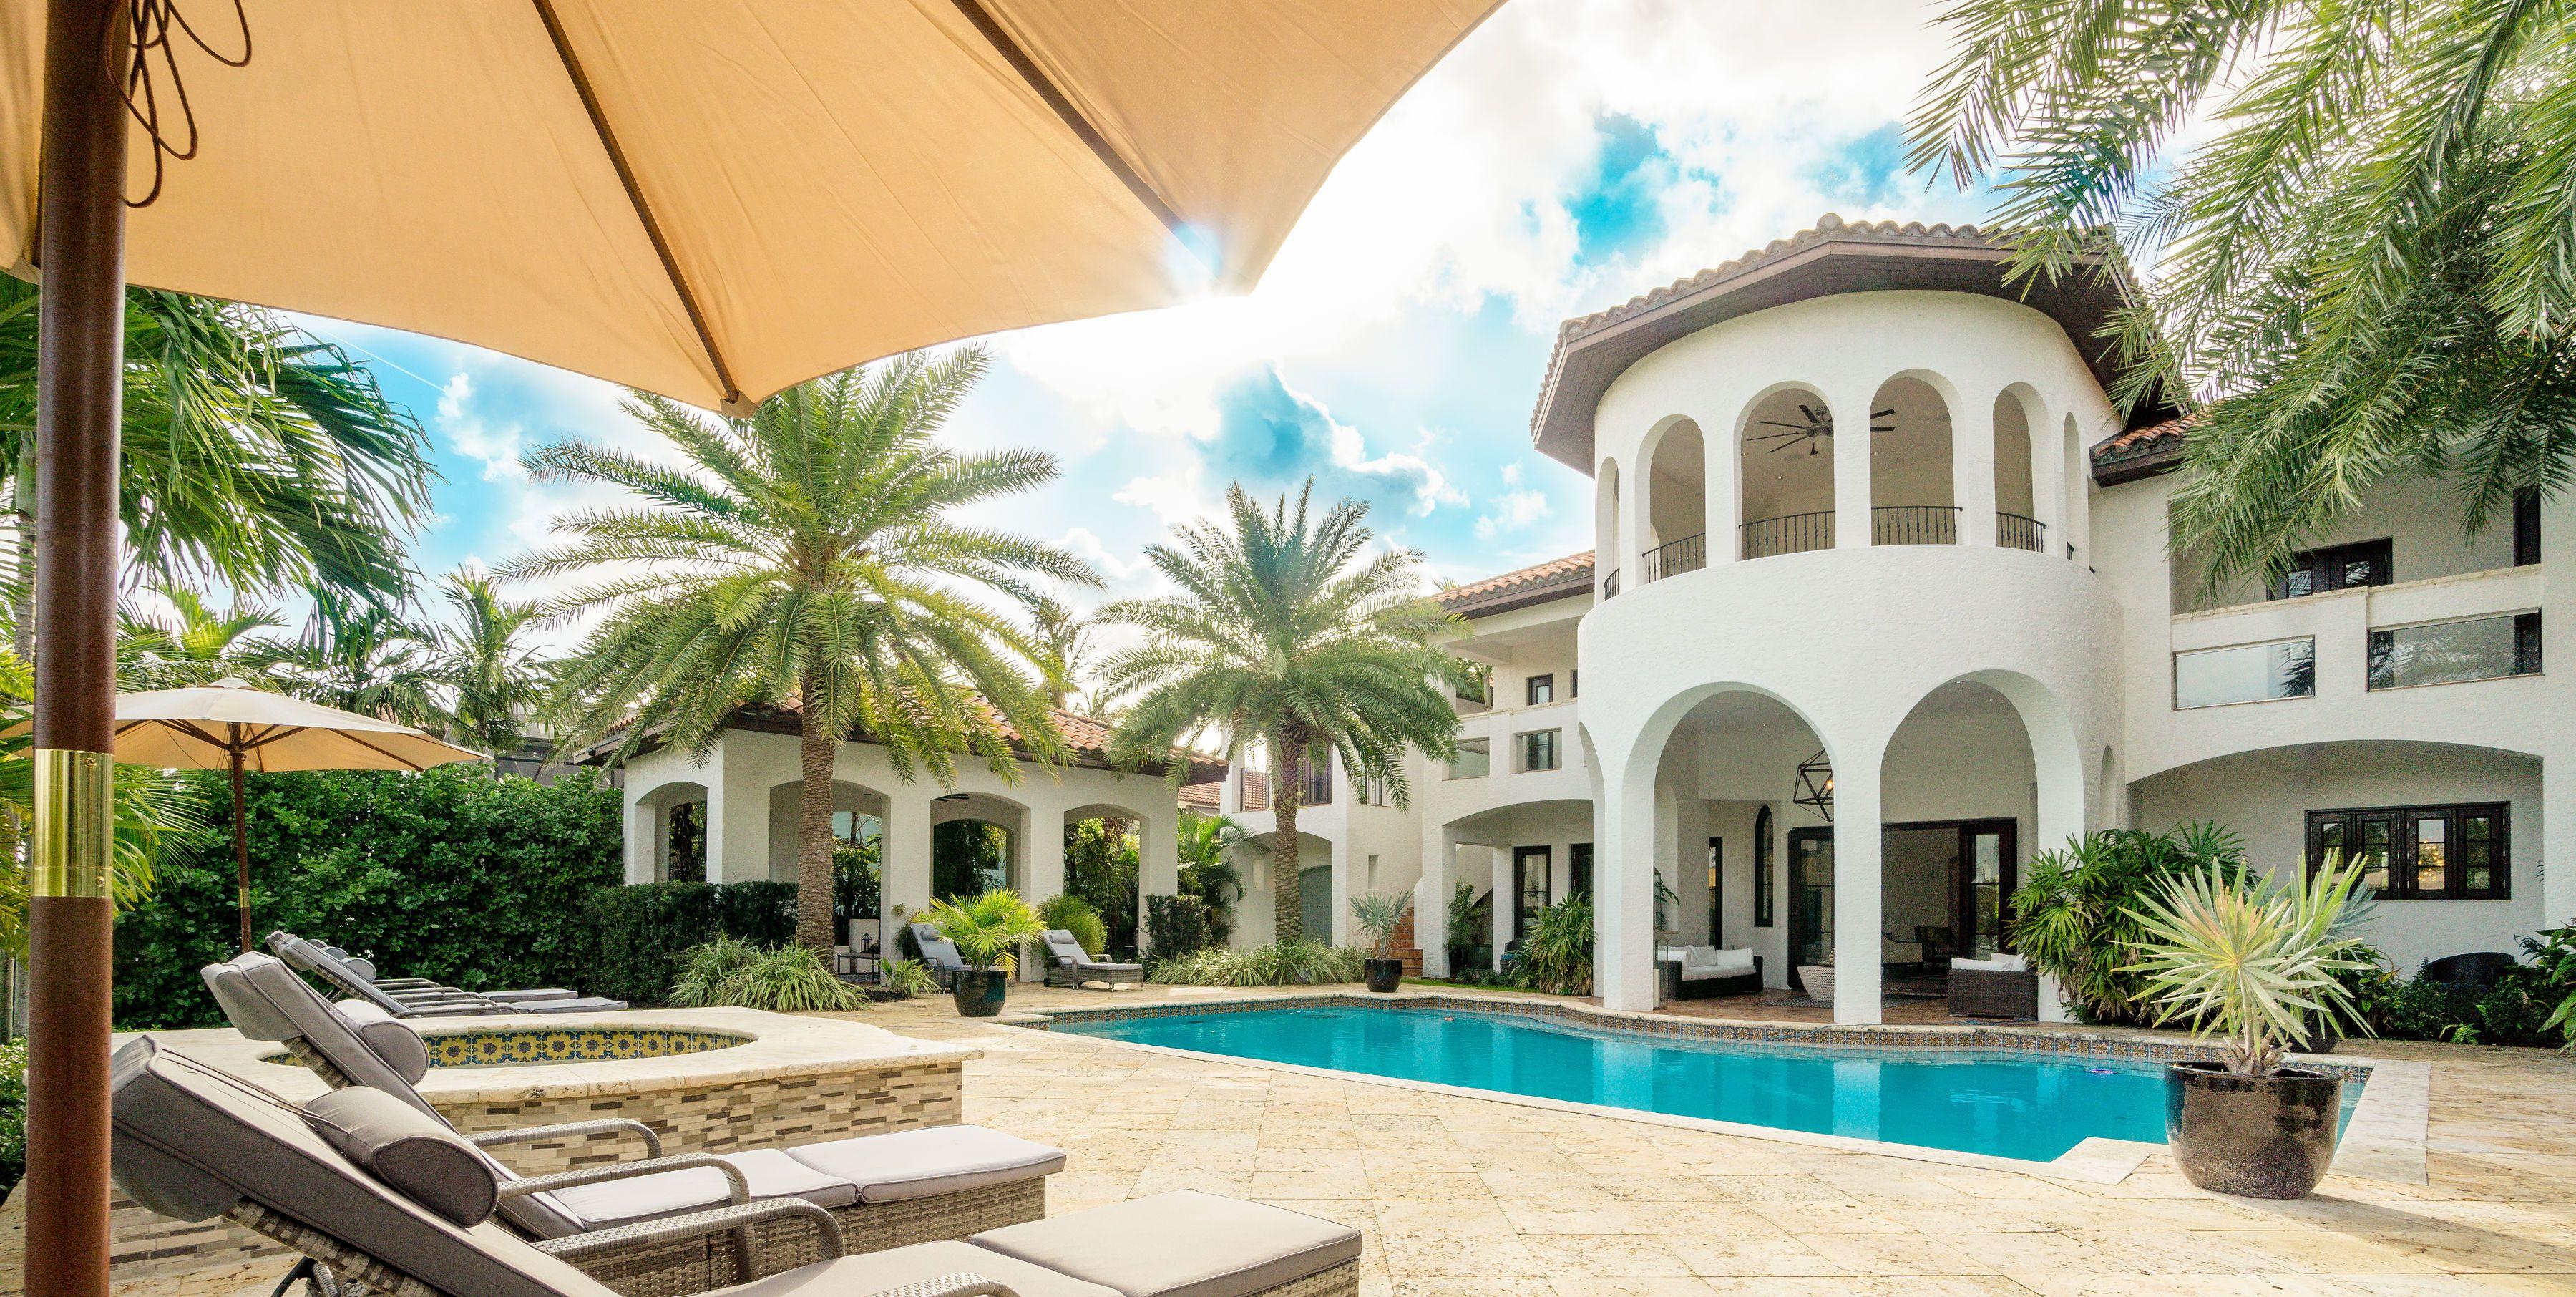 This Mansion Is So Beautiful, It Gave Jamie Foxx a Spiritual Awakening